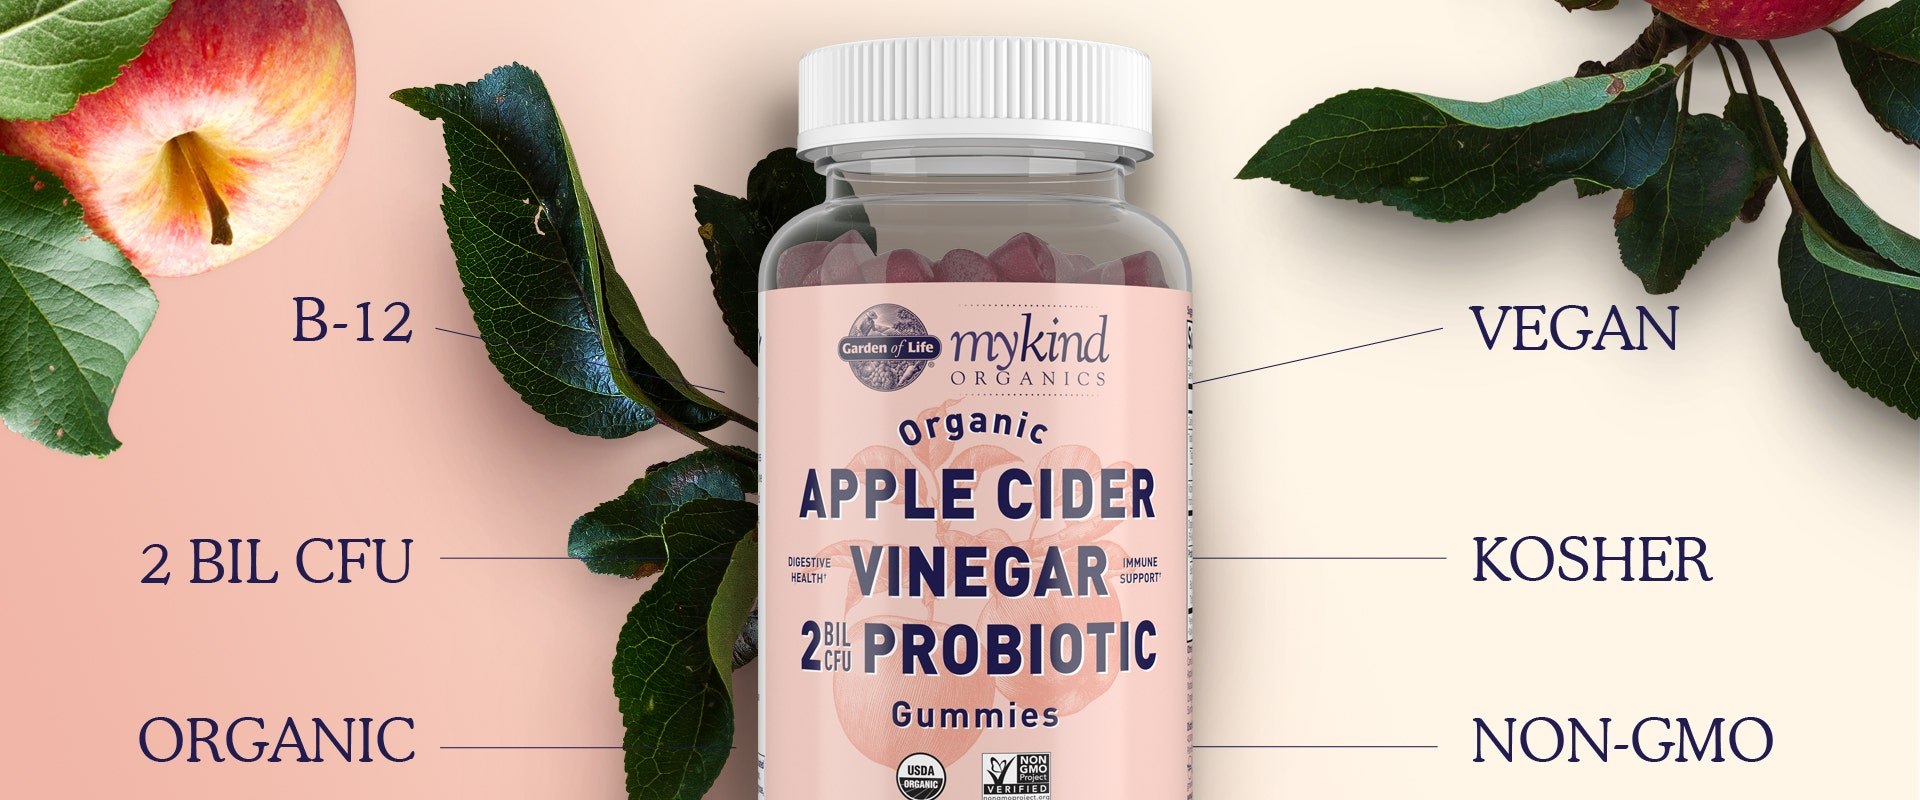 Apple Cider Vinegar Probiotics Gummy Garden of Life mykind Organics